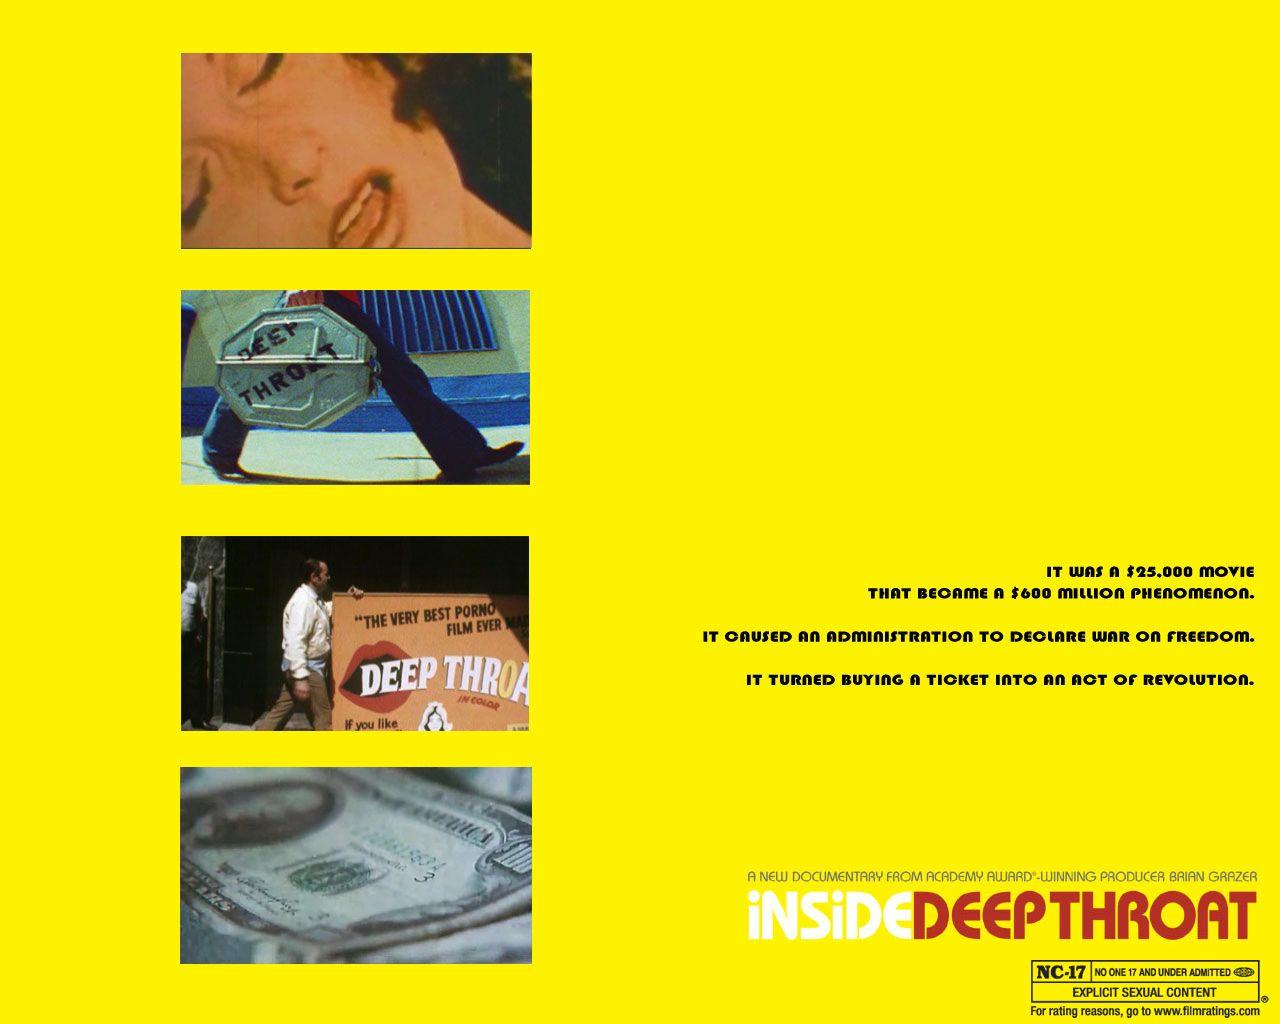 Watch deepthroat documentary